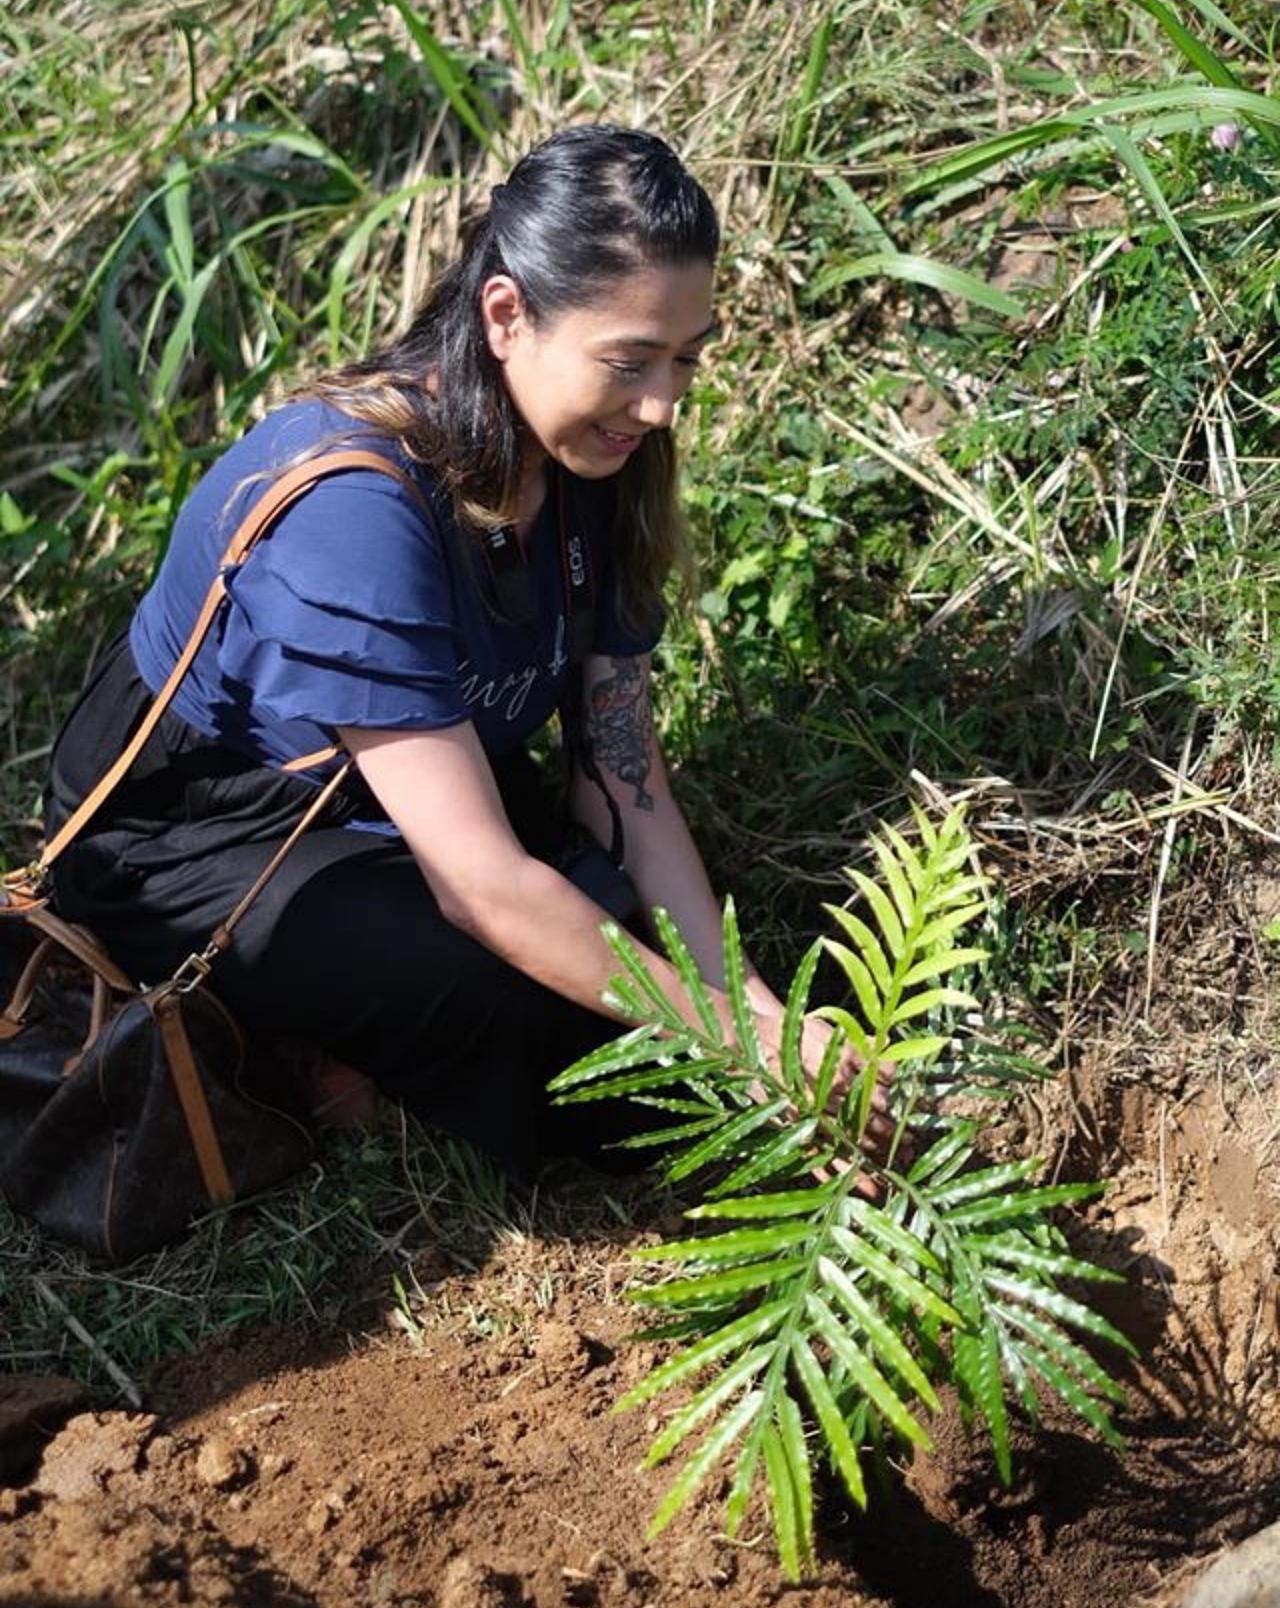 Veidehi Gite Badulla Tree Plantation